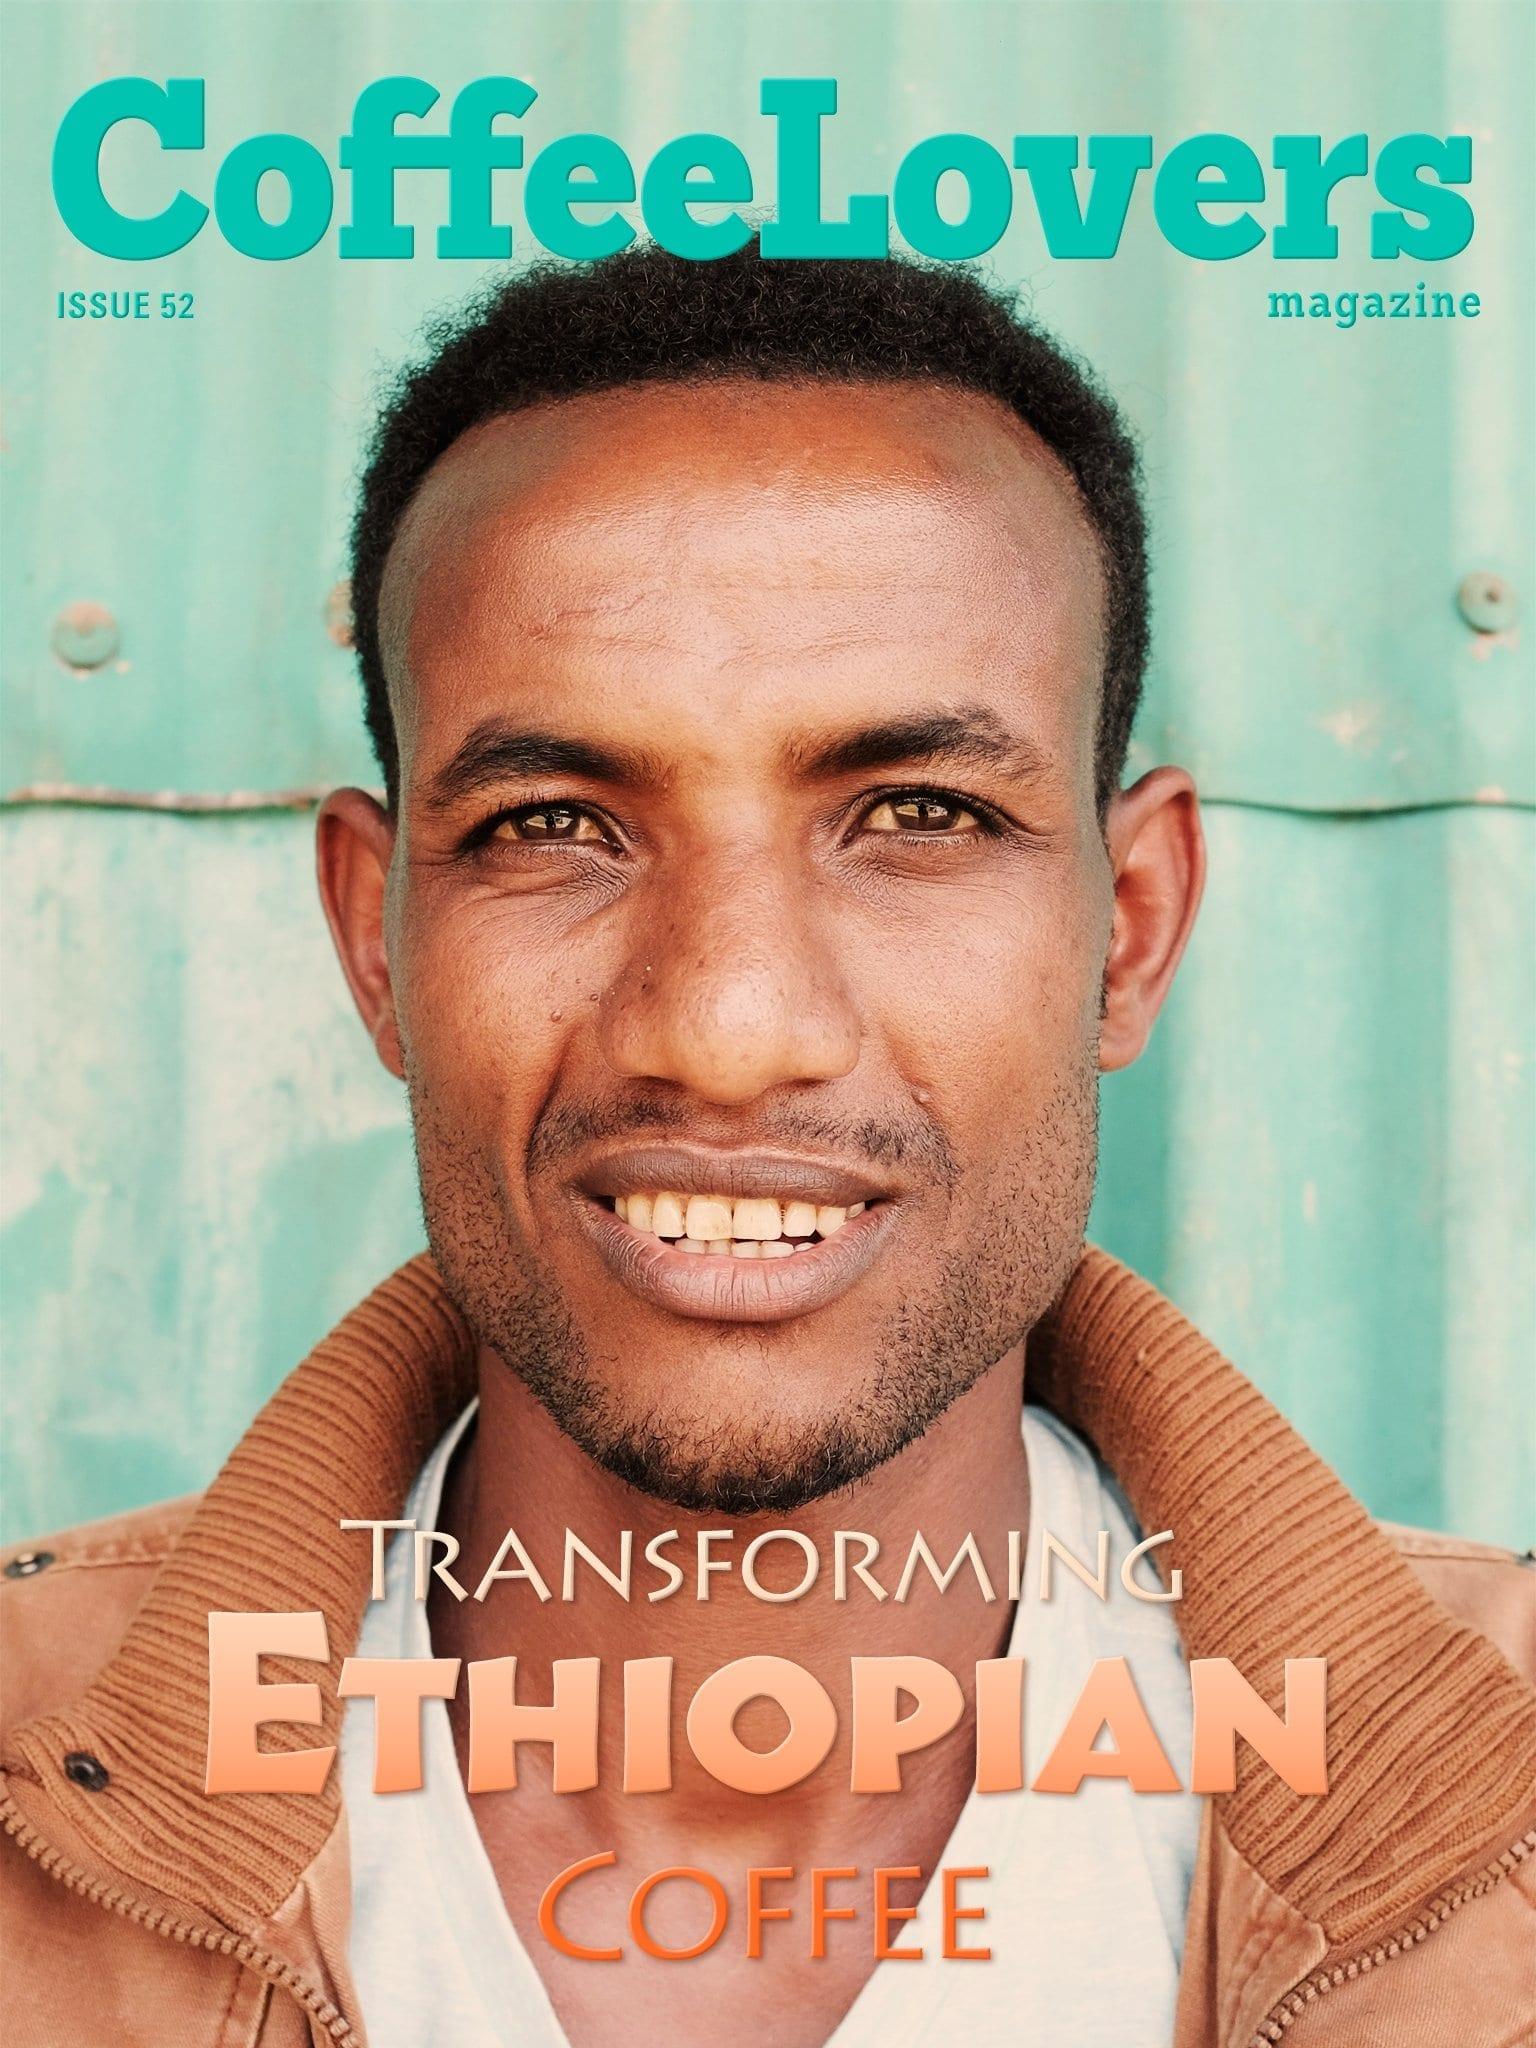 Ethiopian Coffee - Harar - Coffee Lovers Magazine Issue 52